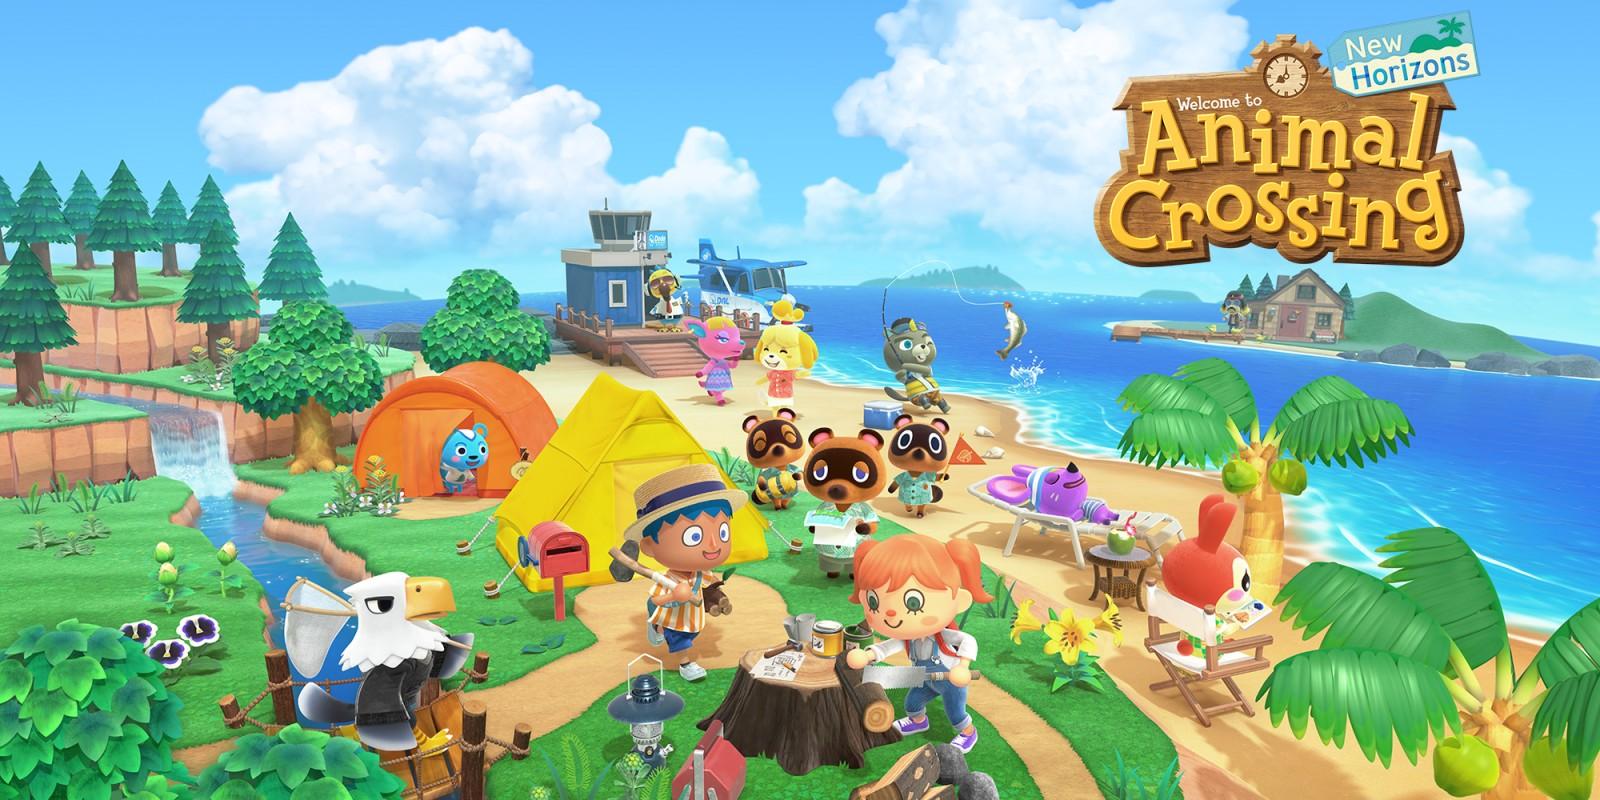 Streamer commits to 2-week Animal Crossing: New Horizons livestream